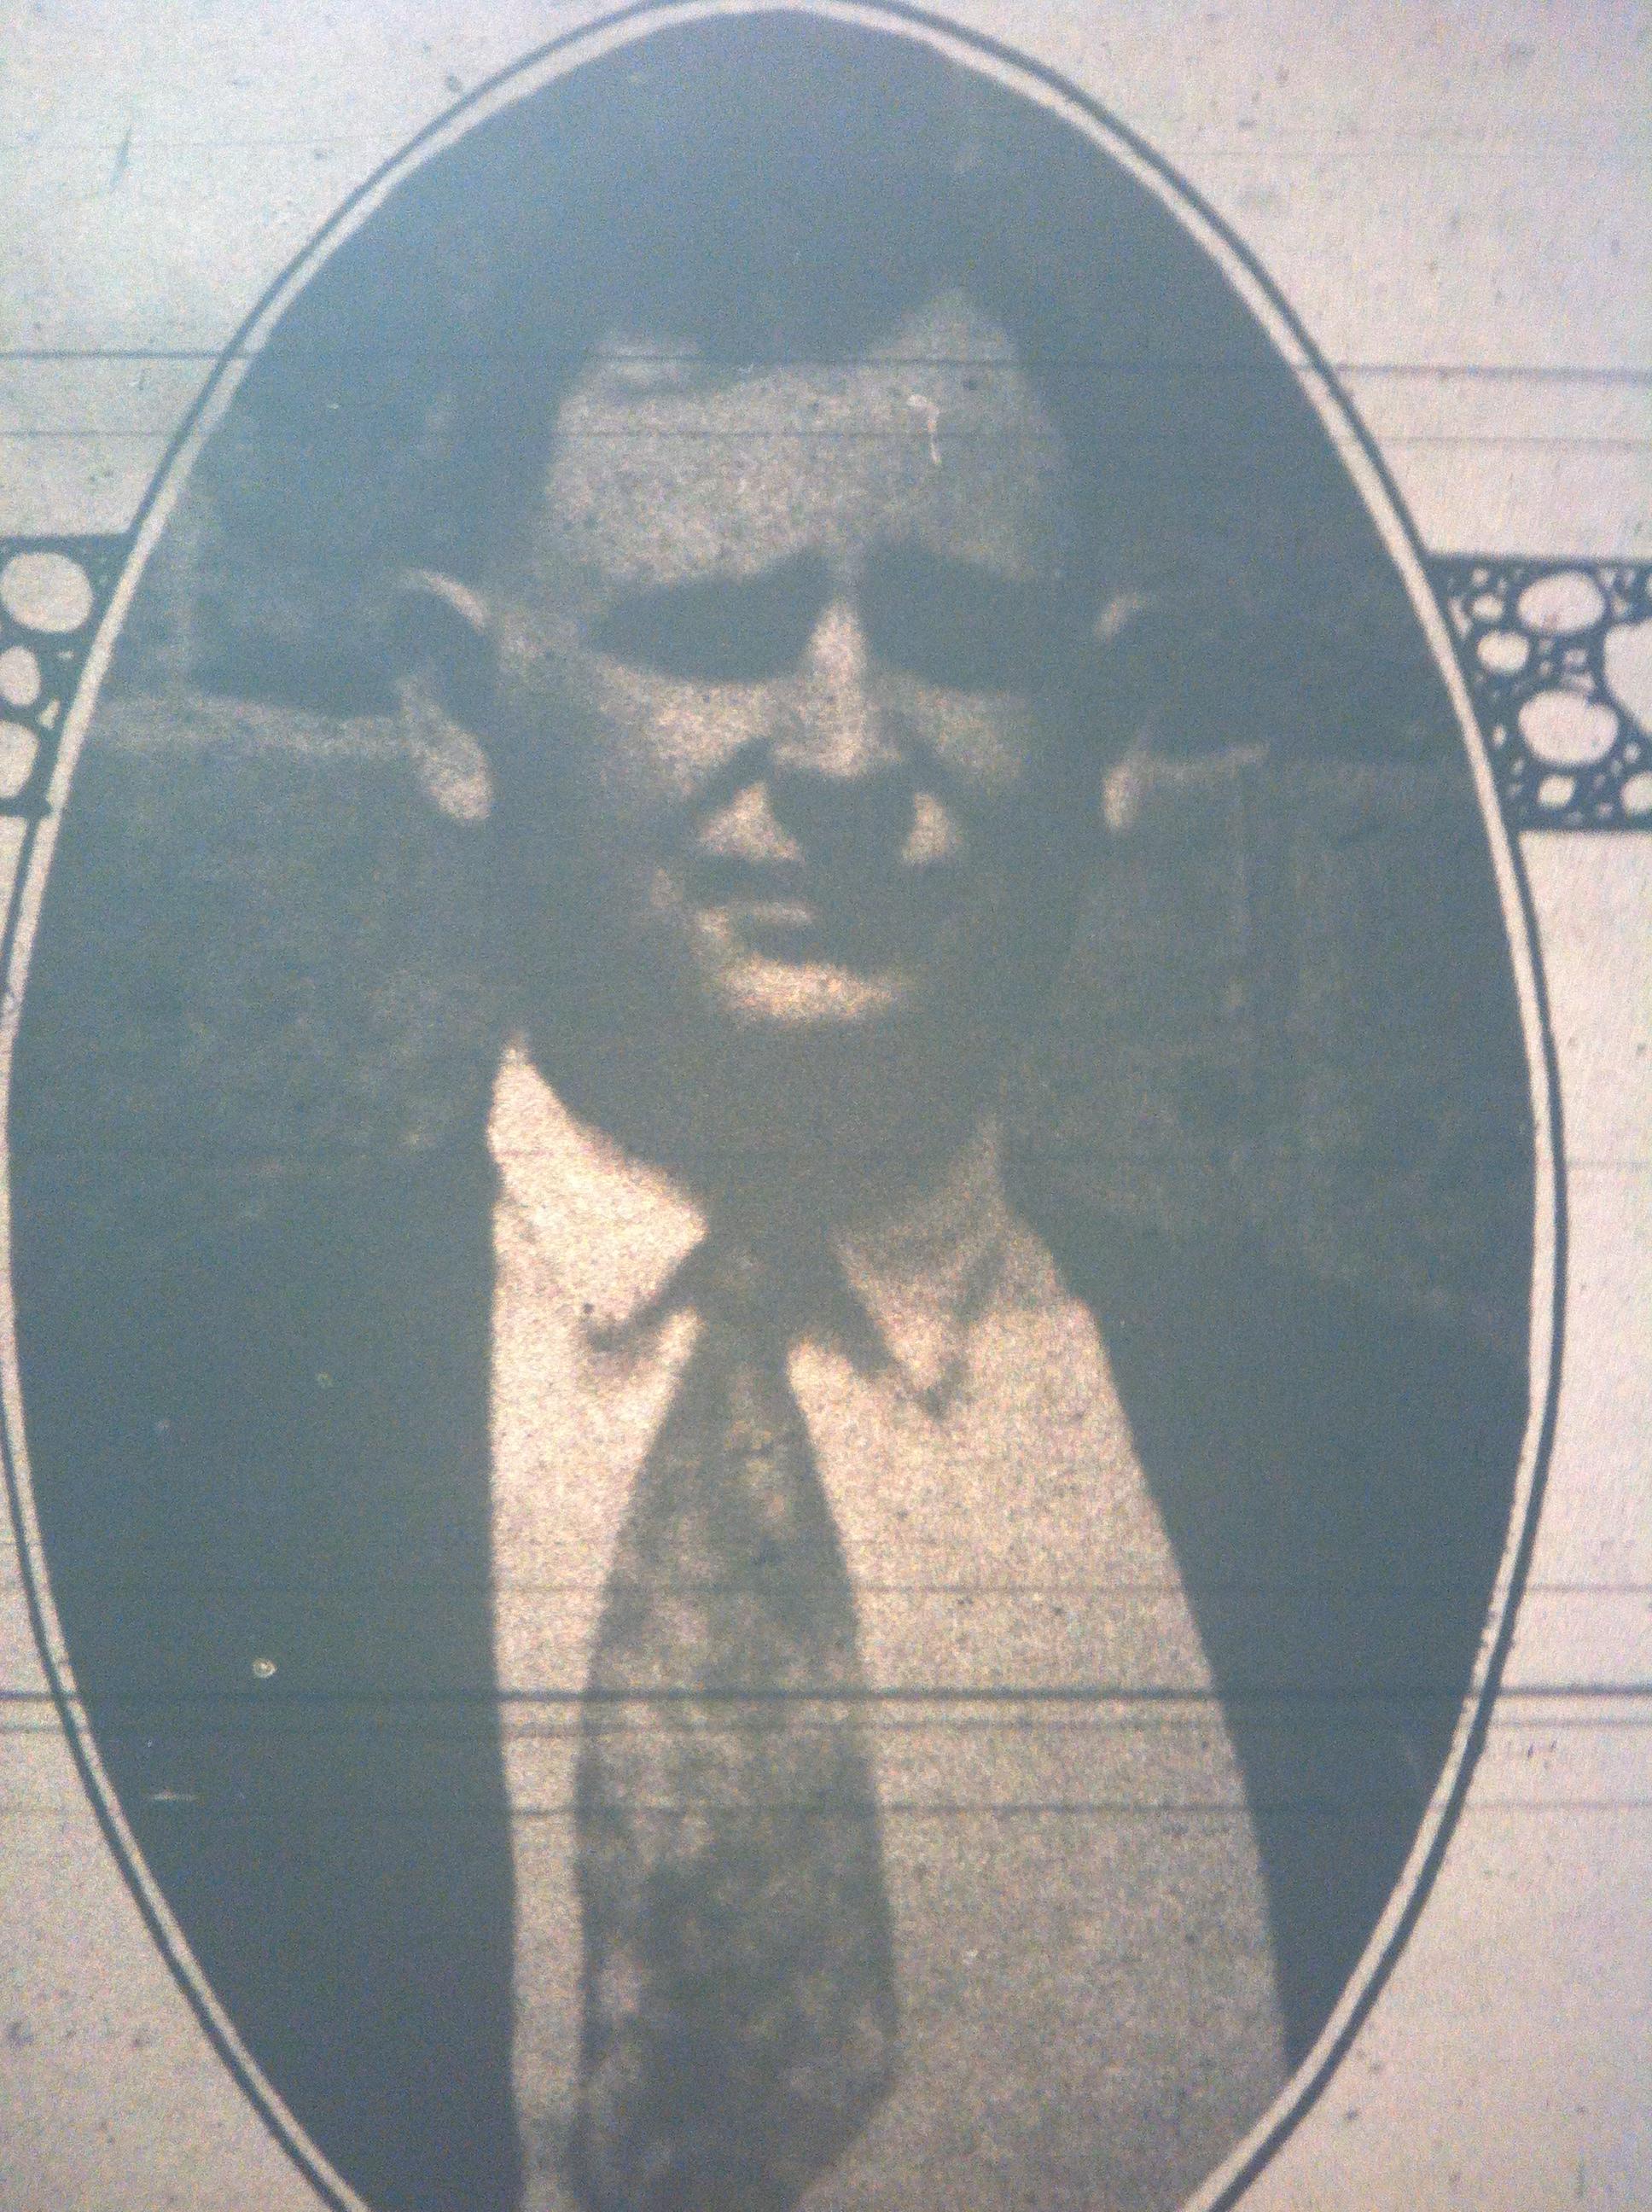 Tennis Hatfield Photo LB 10.08.1926 2.JPG